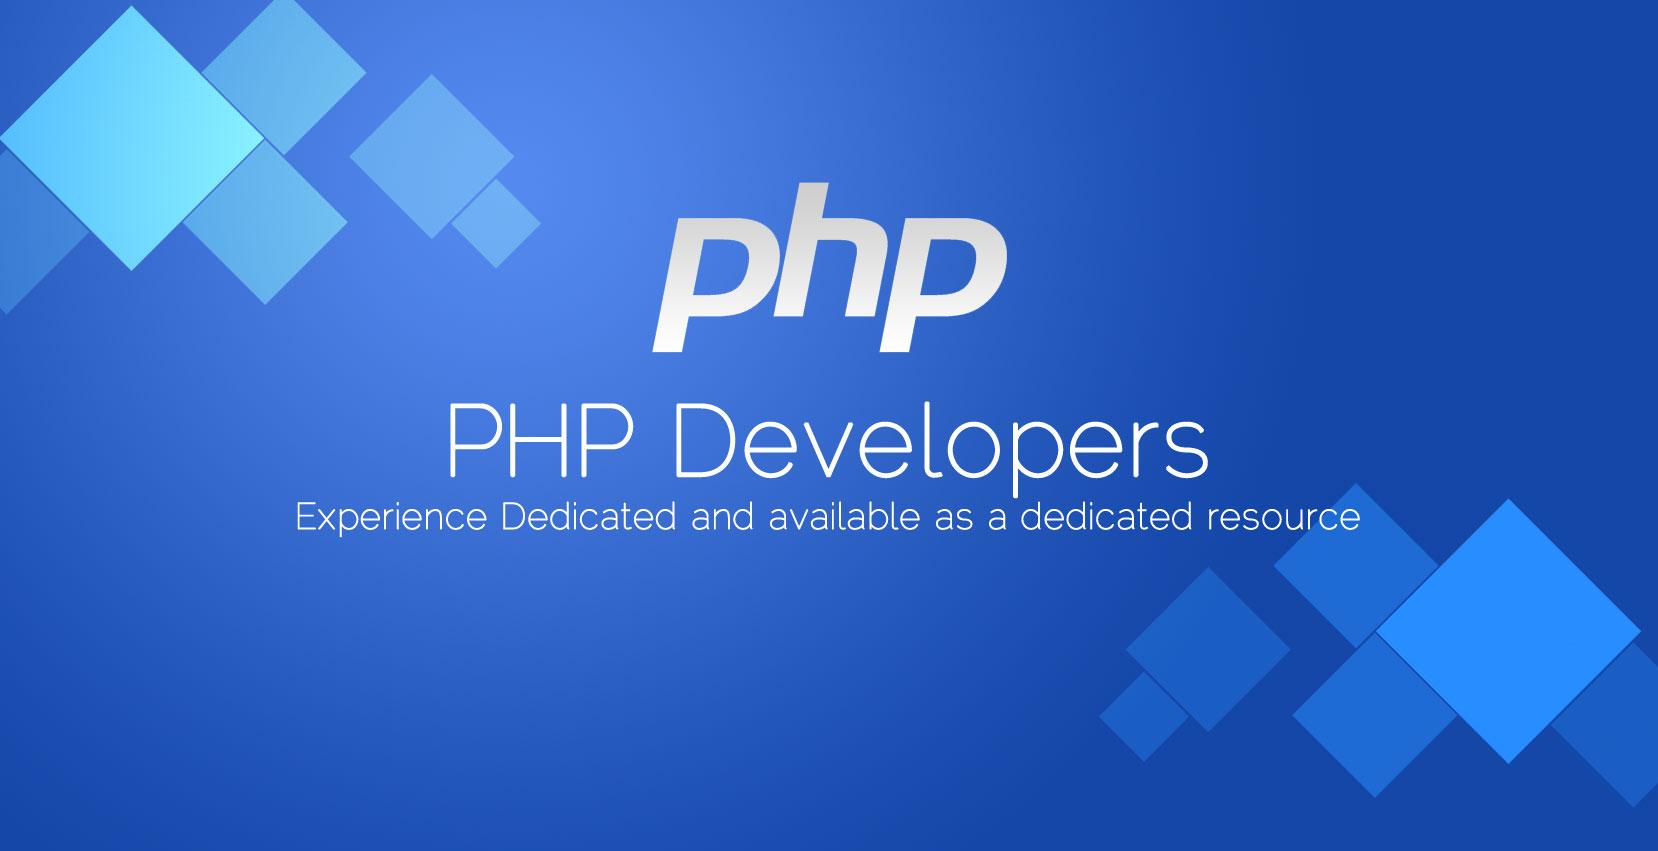 TUYỂN GẤP PHP Developer